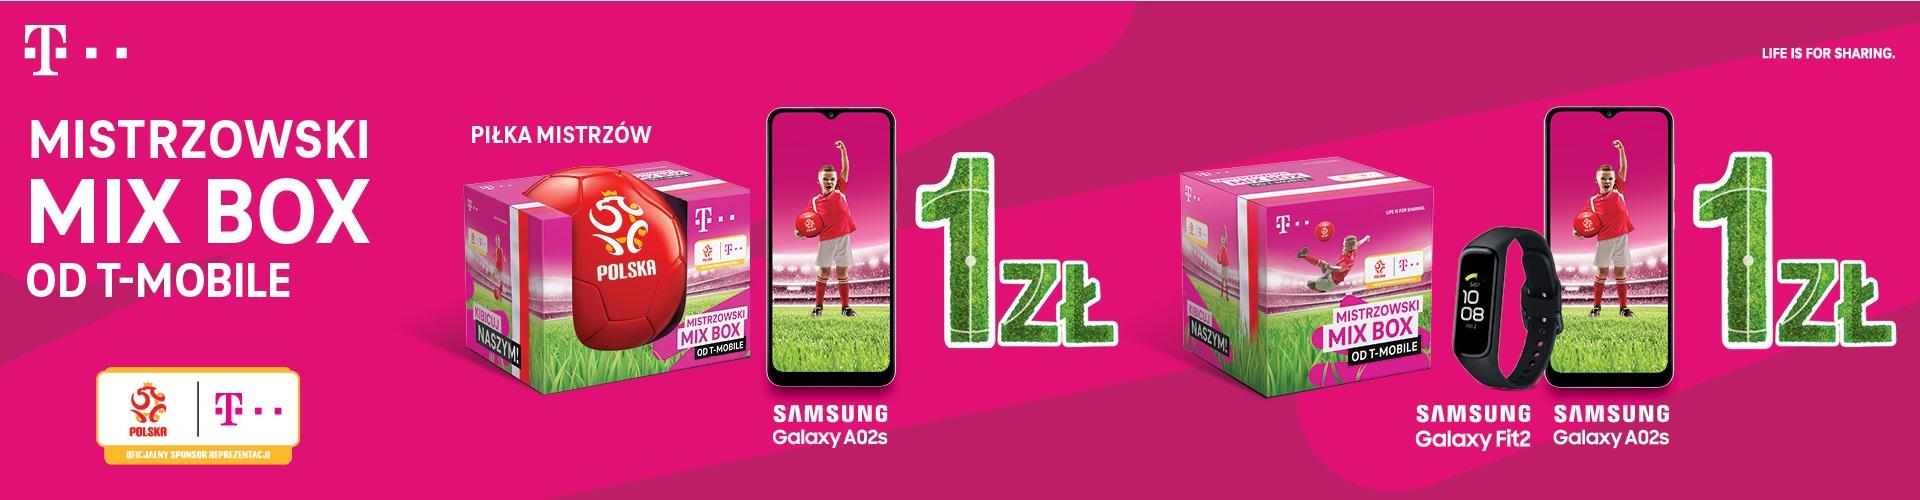 T-Mobile MIX BOX na UEFA 2021 zestawy